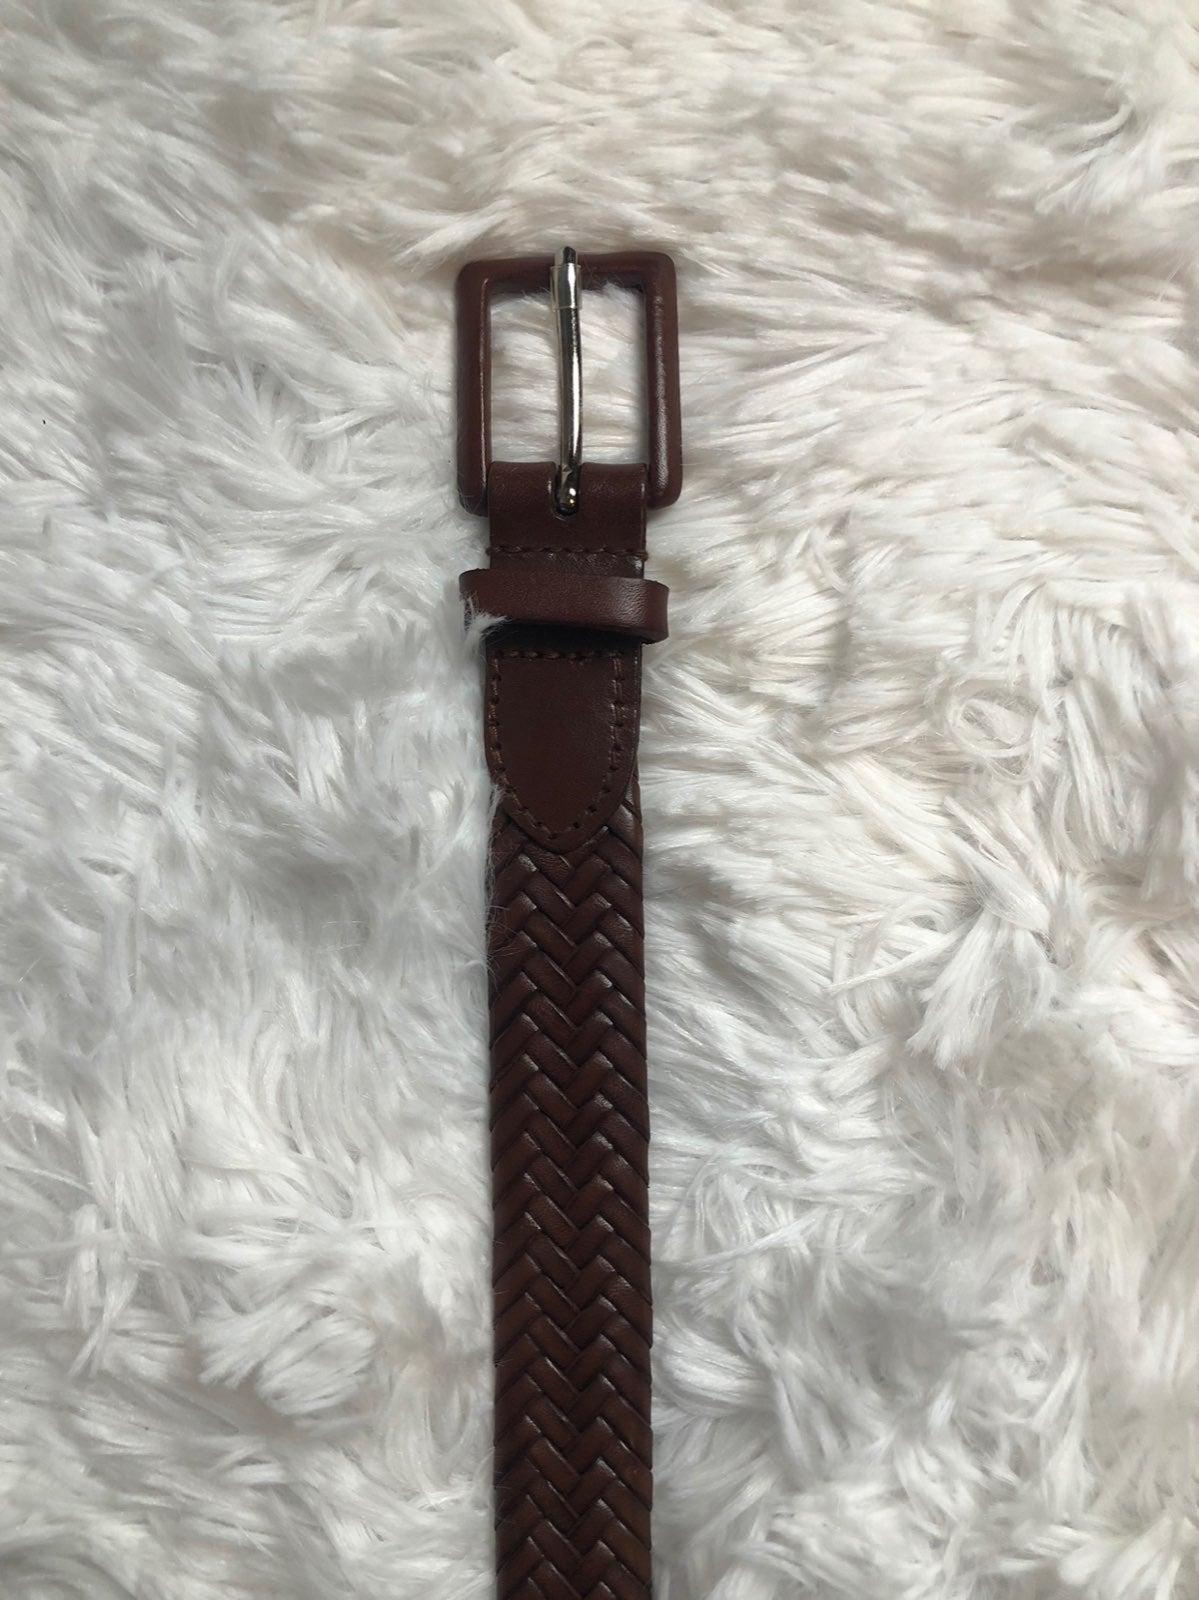 NWOT Talbots Brown braded Leather Belt S